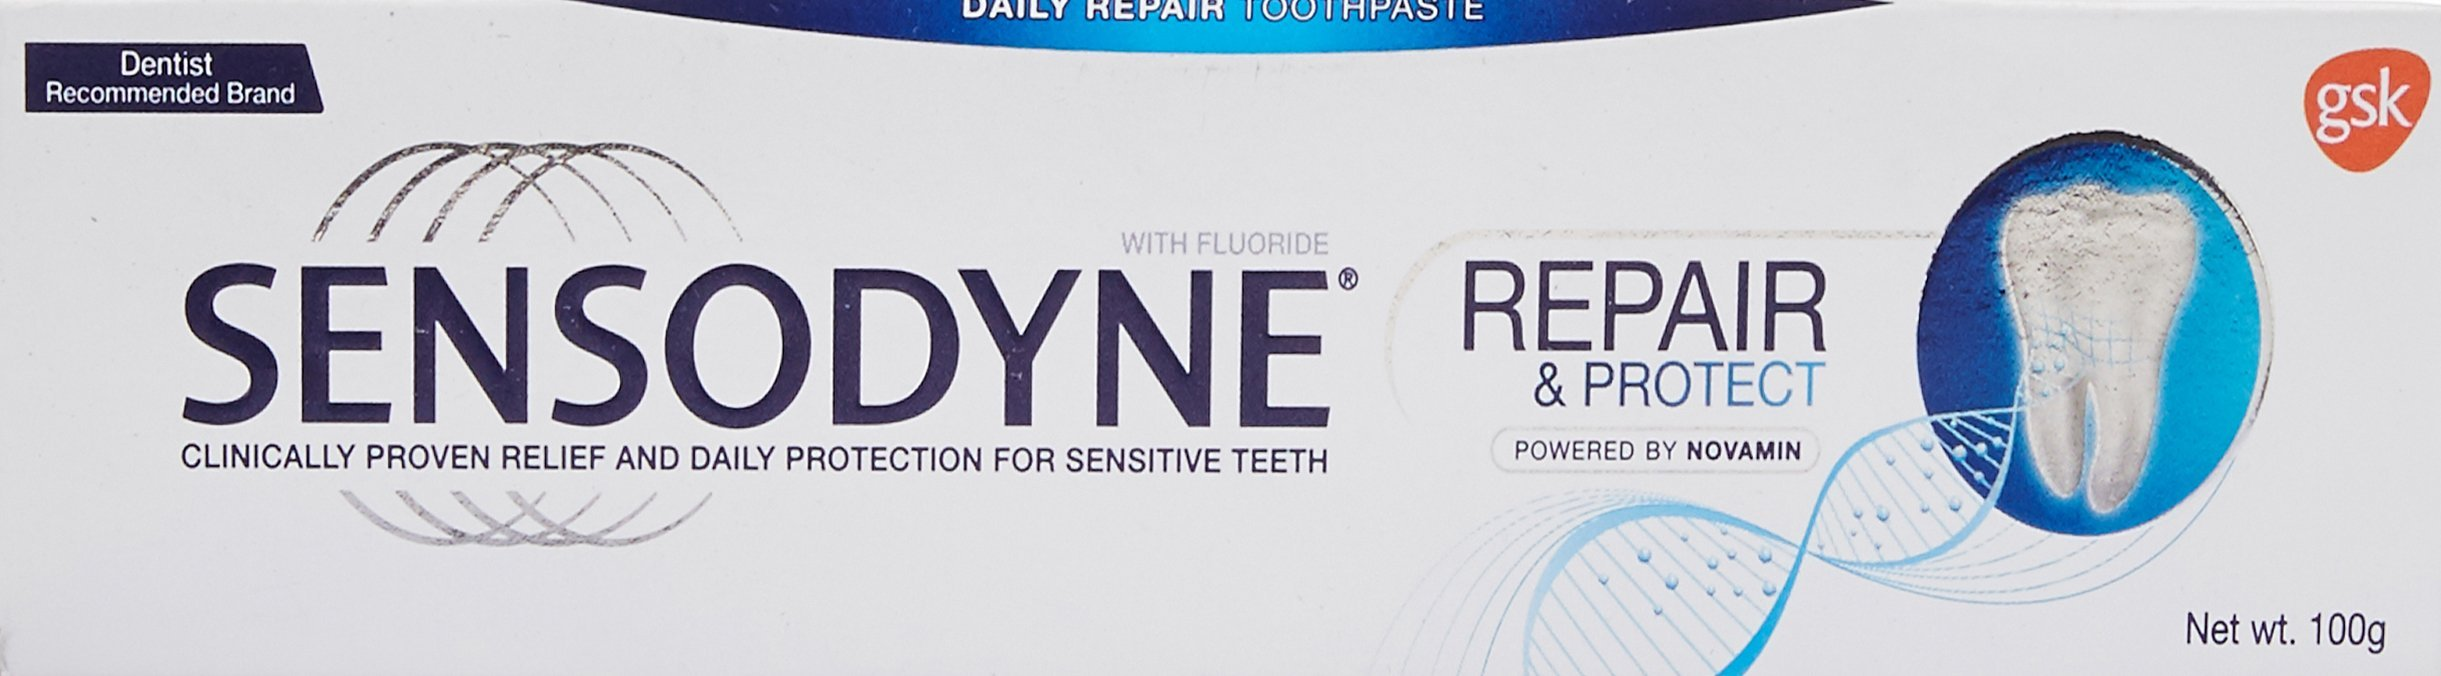 Sensodyne Sensitive Toothpaste Repair & Protect - 100 g product image